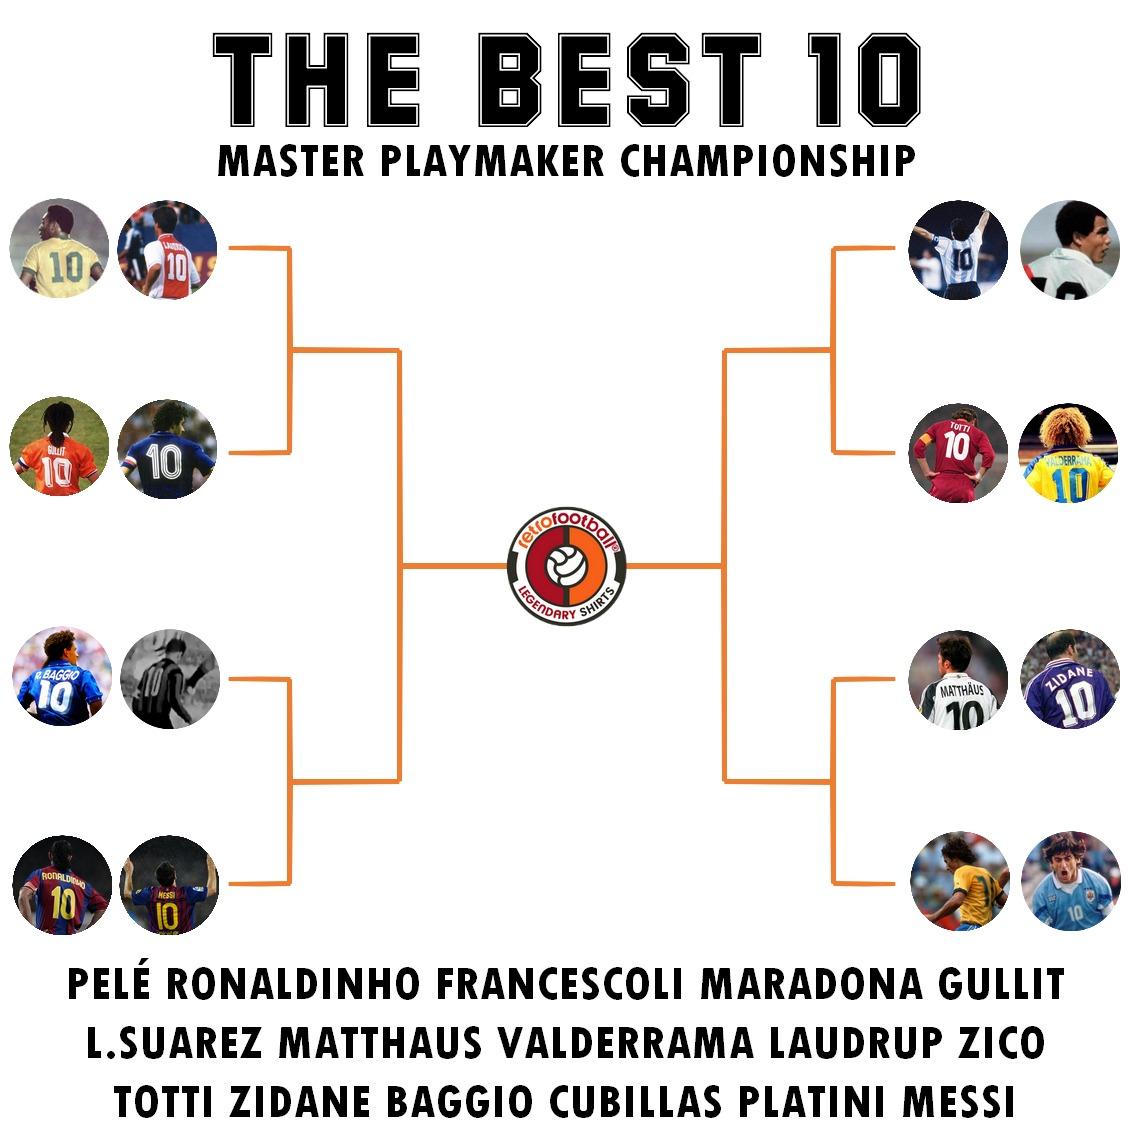 The best 10 - Master Playmaker Championship de Retrofootball - el cuadro